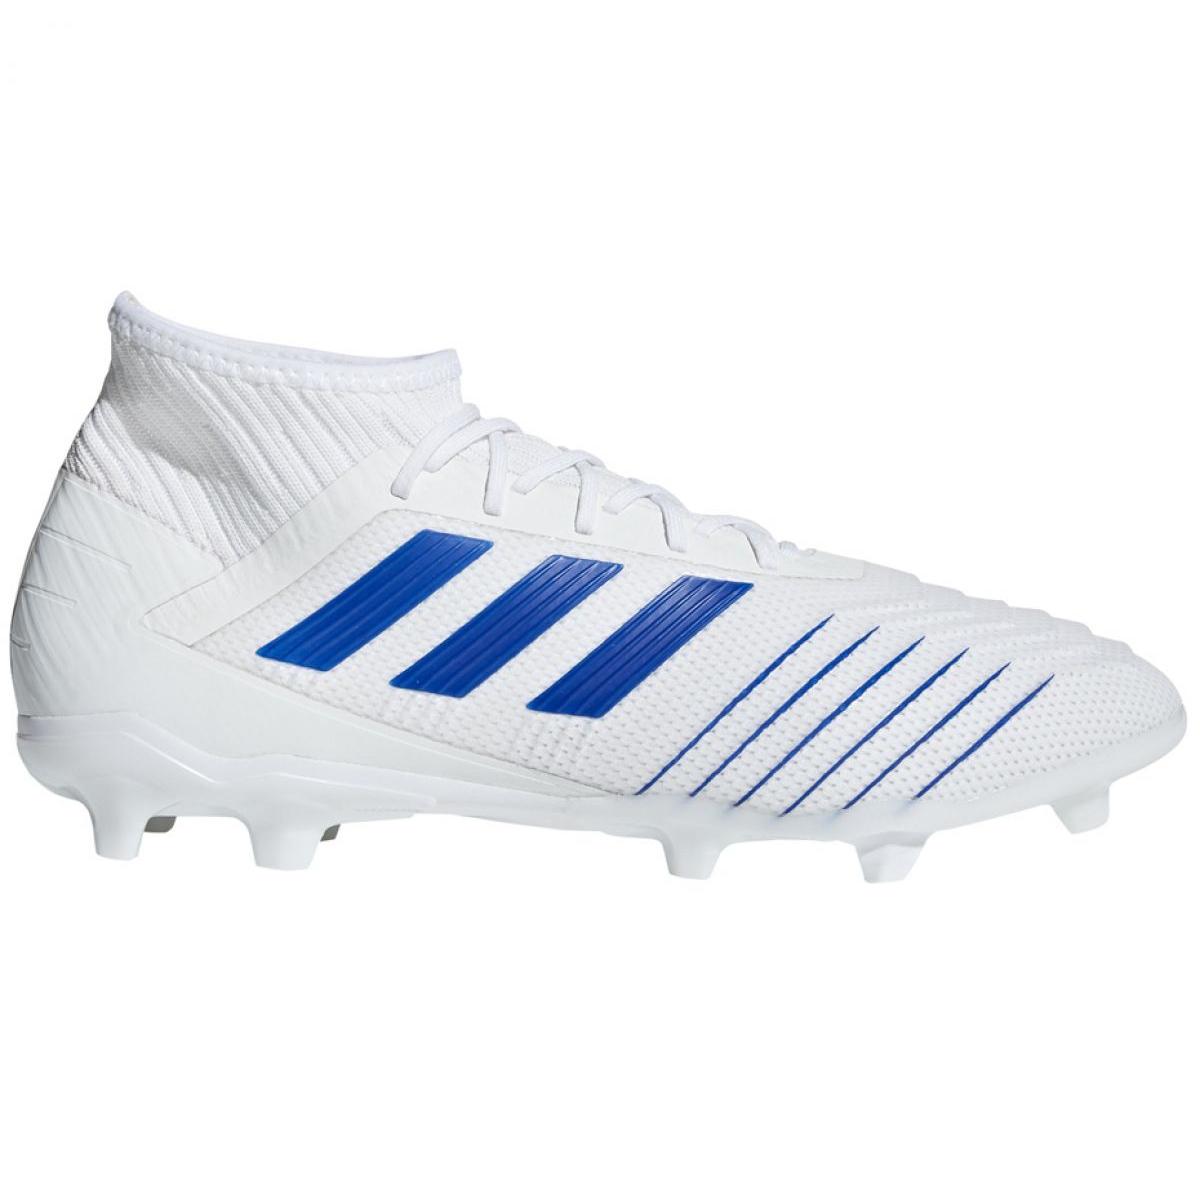 Football boots adidas Predator 19.2 Fg